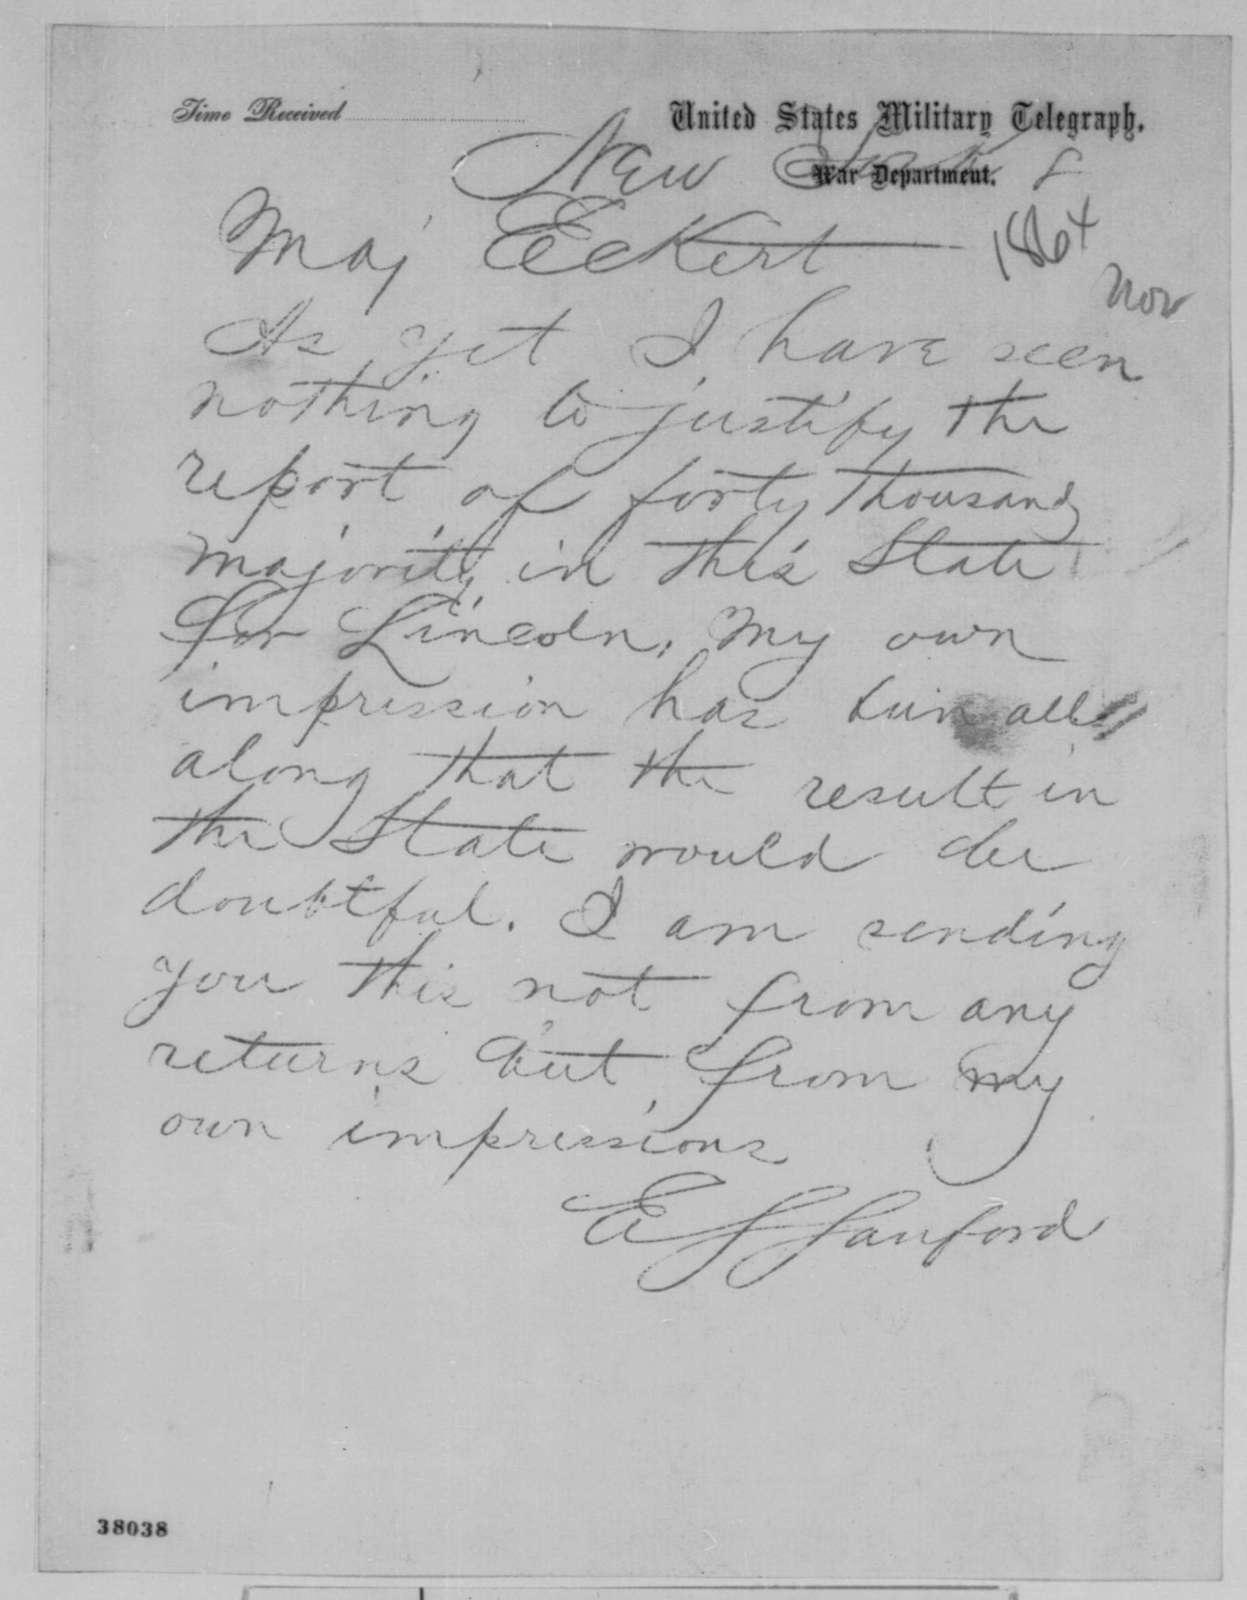 Edward S. Sanford to Thomas T. Eckert, Tuesday, November 08, 1864  (Telegram reporting New York election results)